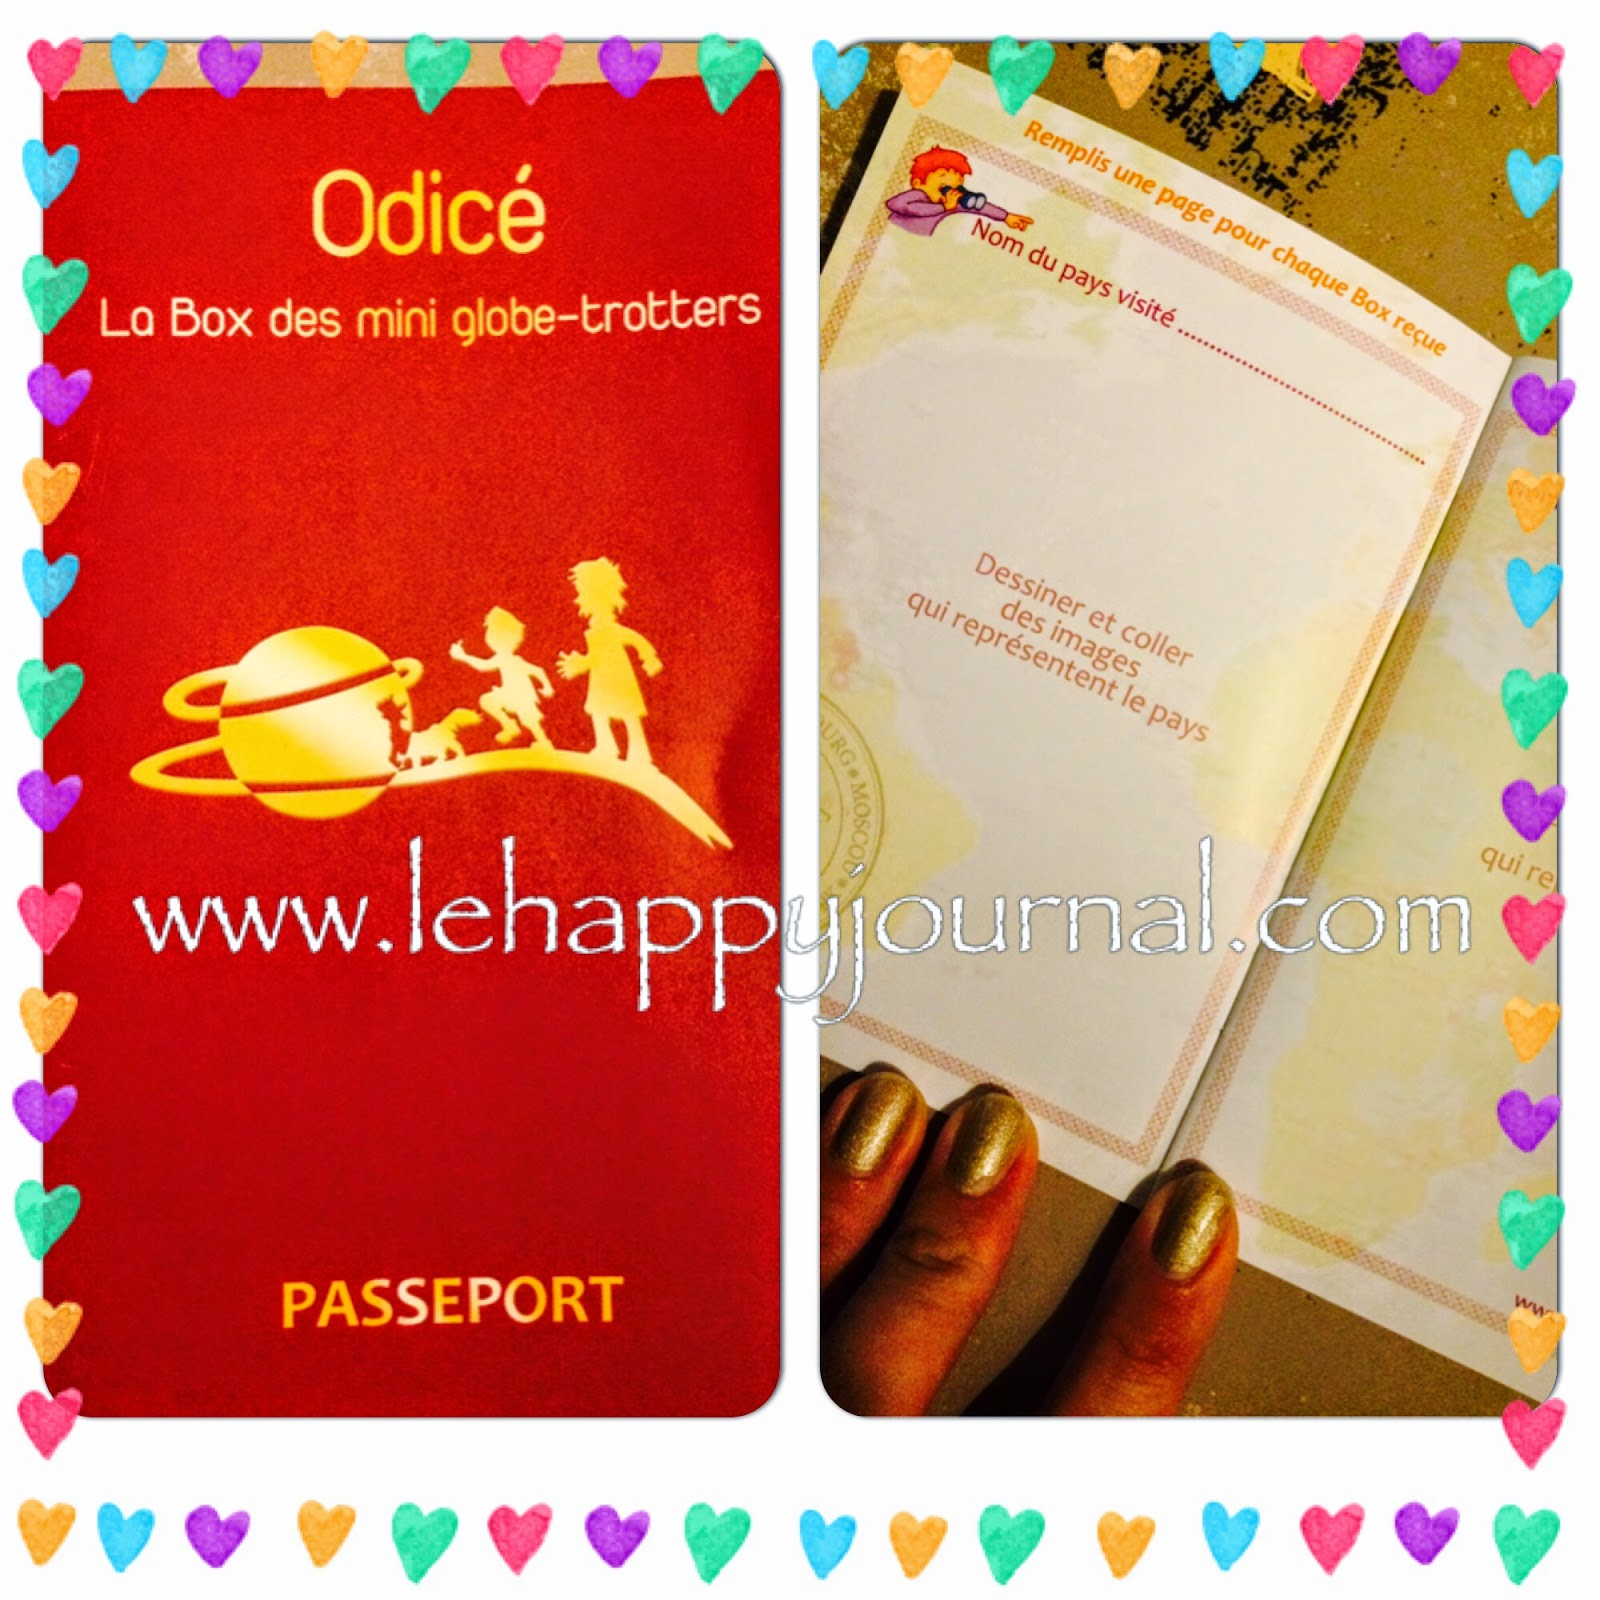 Box Odicé Thailande, Odicé, odice, box enfant, creatif, globe trotter, partenaire, happy journal, activité